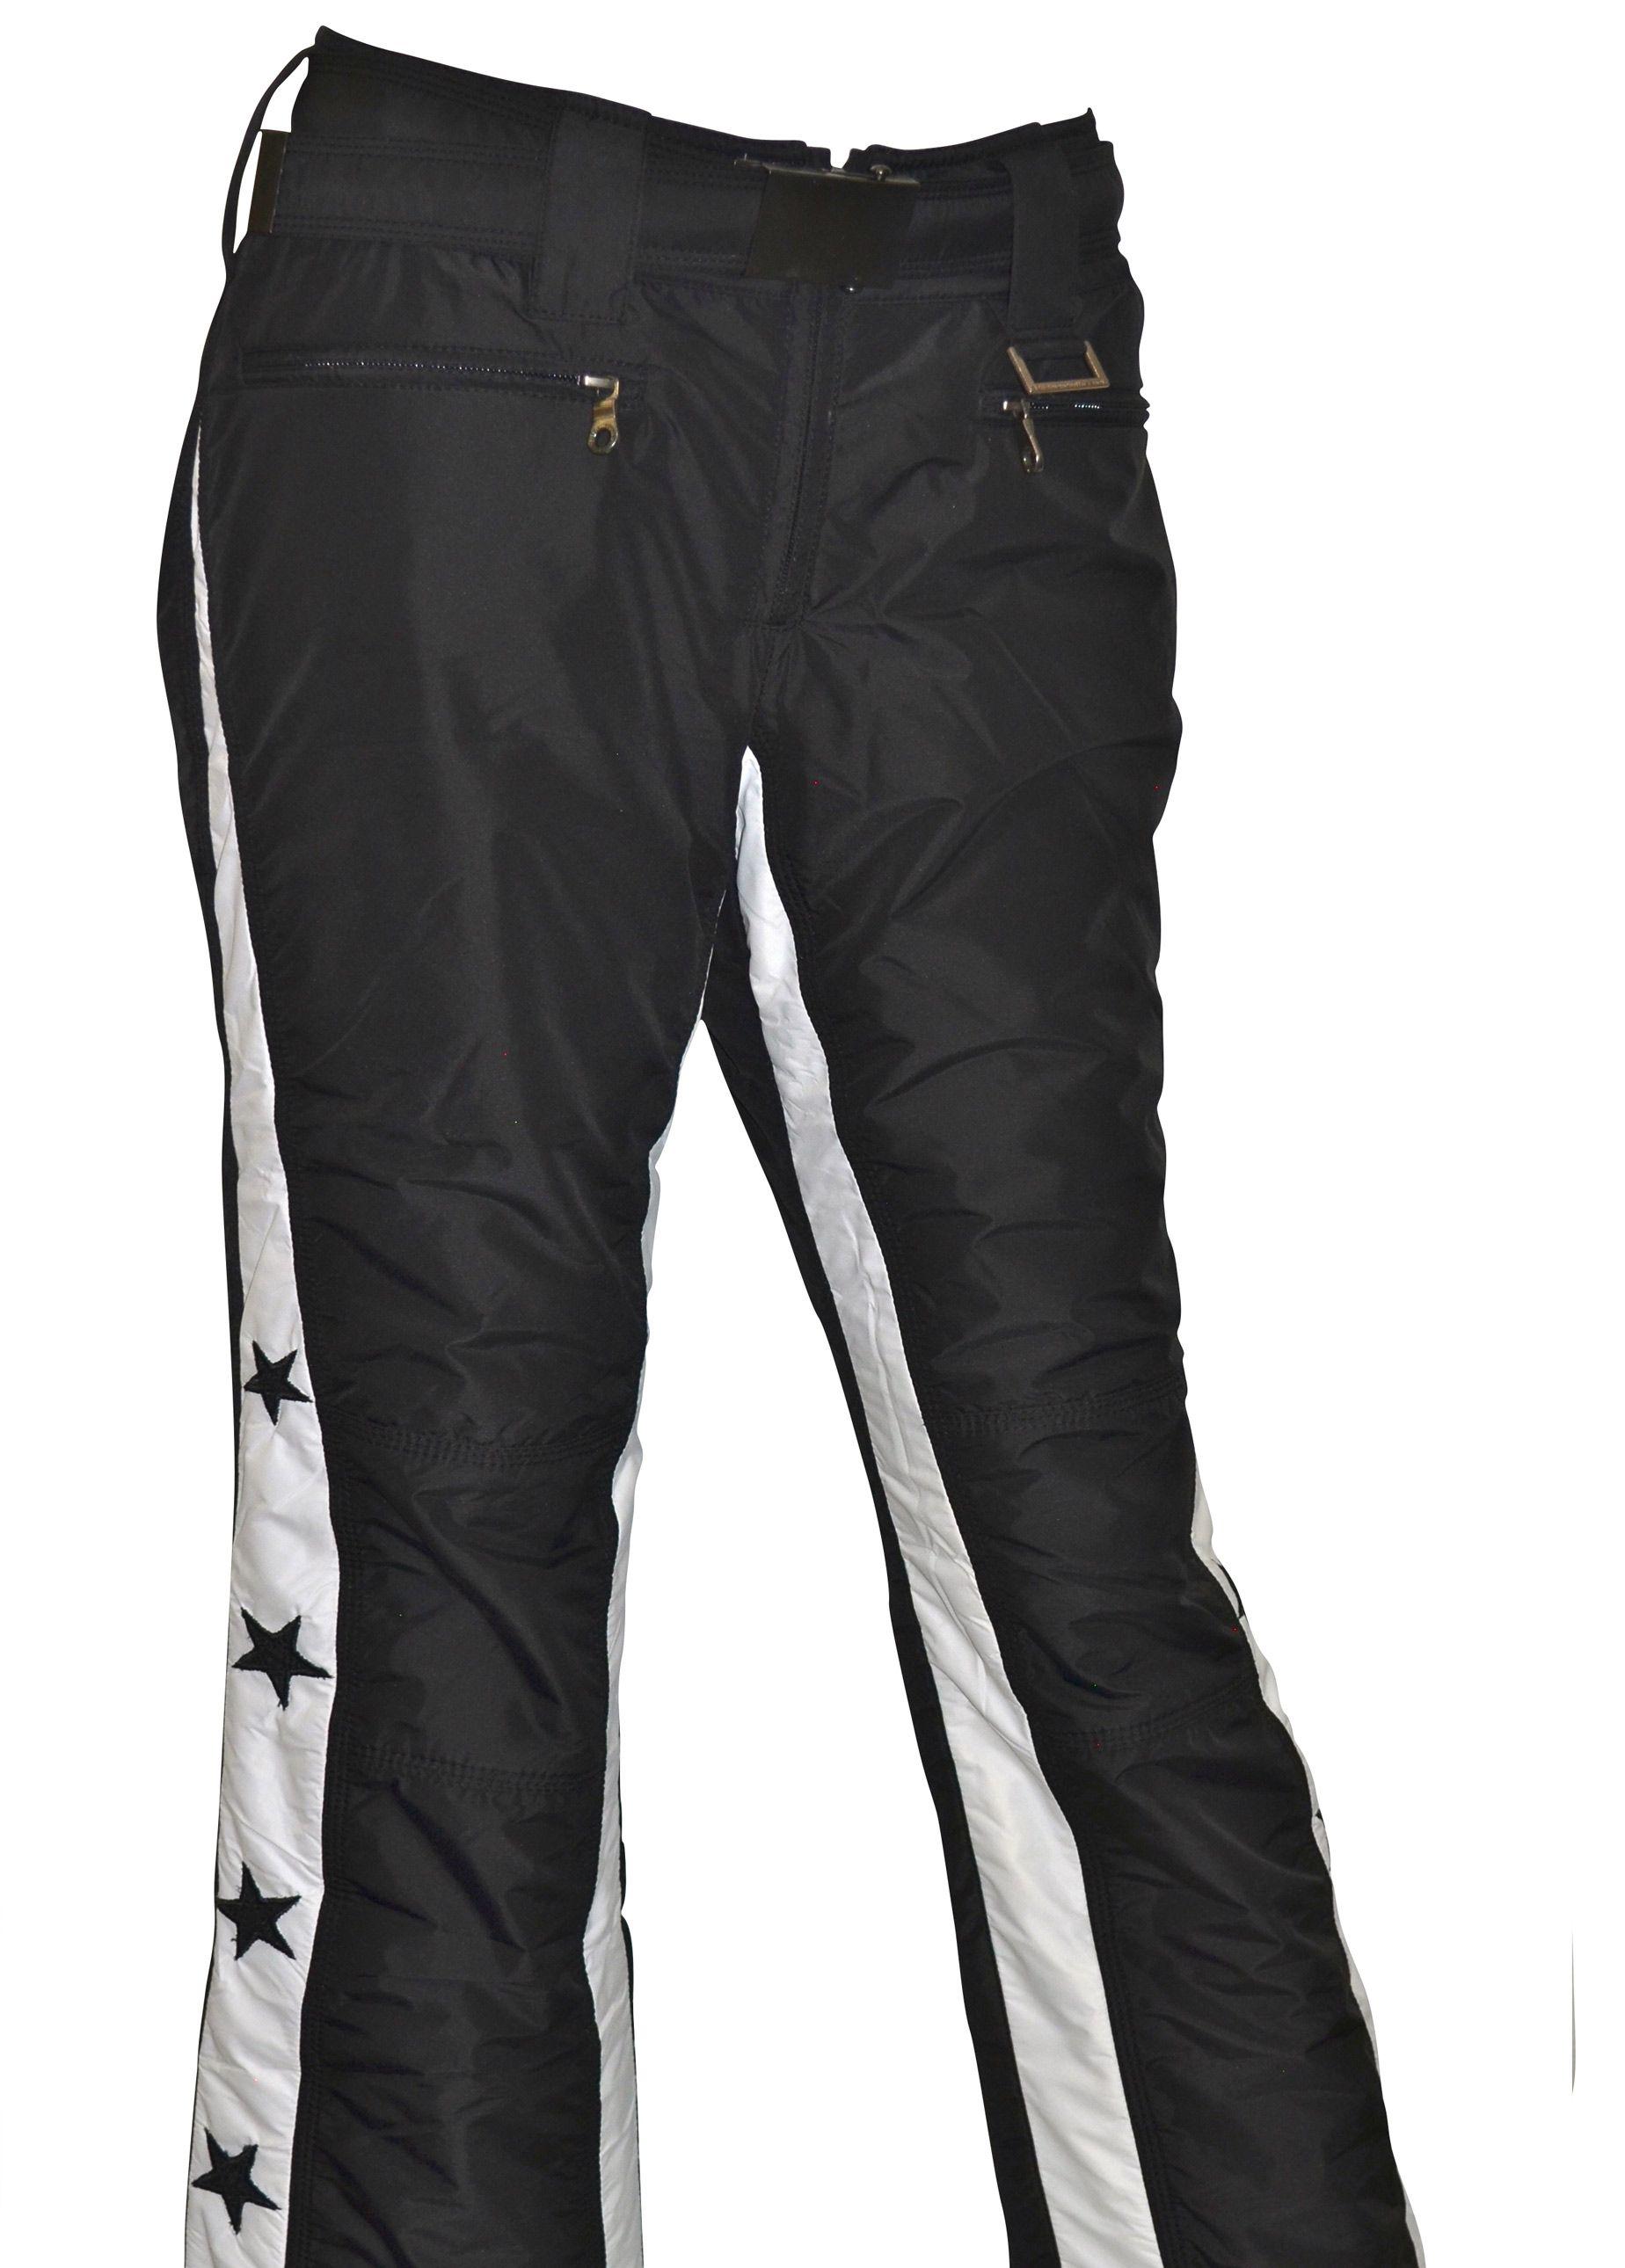 6ba91ee41 STAR INSULATED SKI PANT FOR WOMEN #SkiWear #Ski #Skiing #Women #Fashion  #FUN #skipants